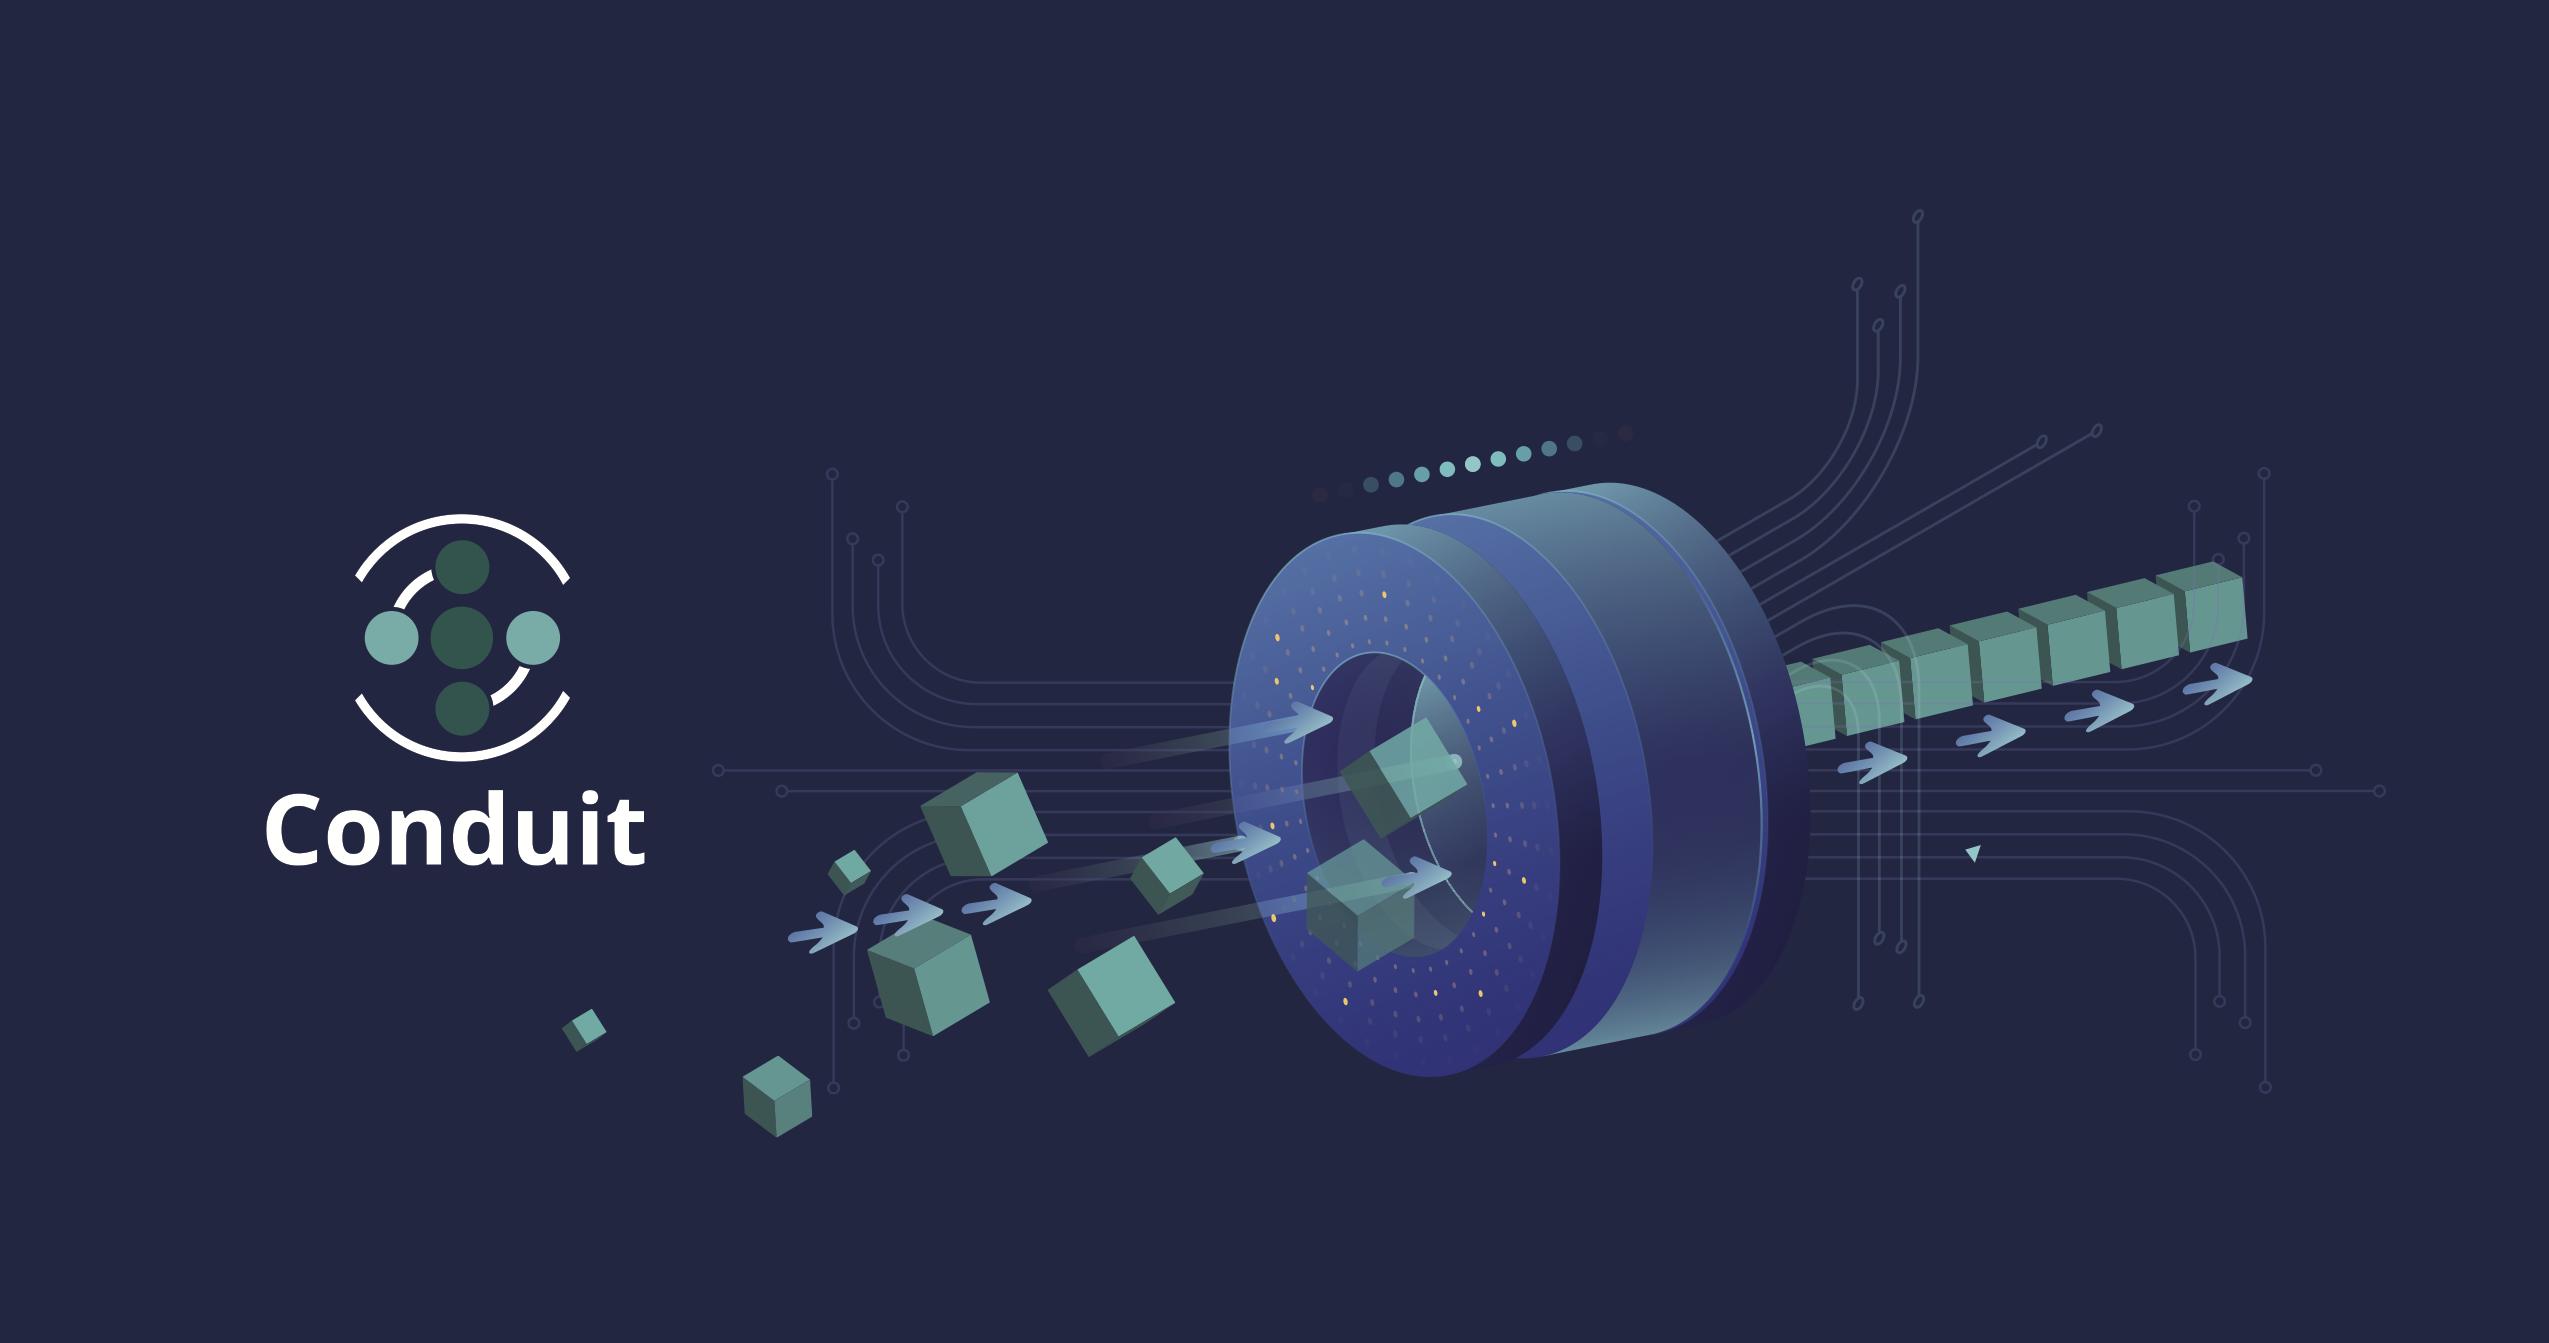 IntelliTect's Conduit software flowchart graphic